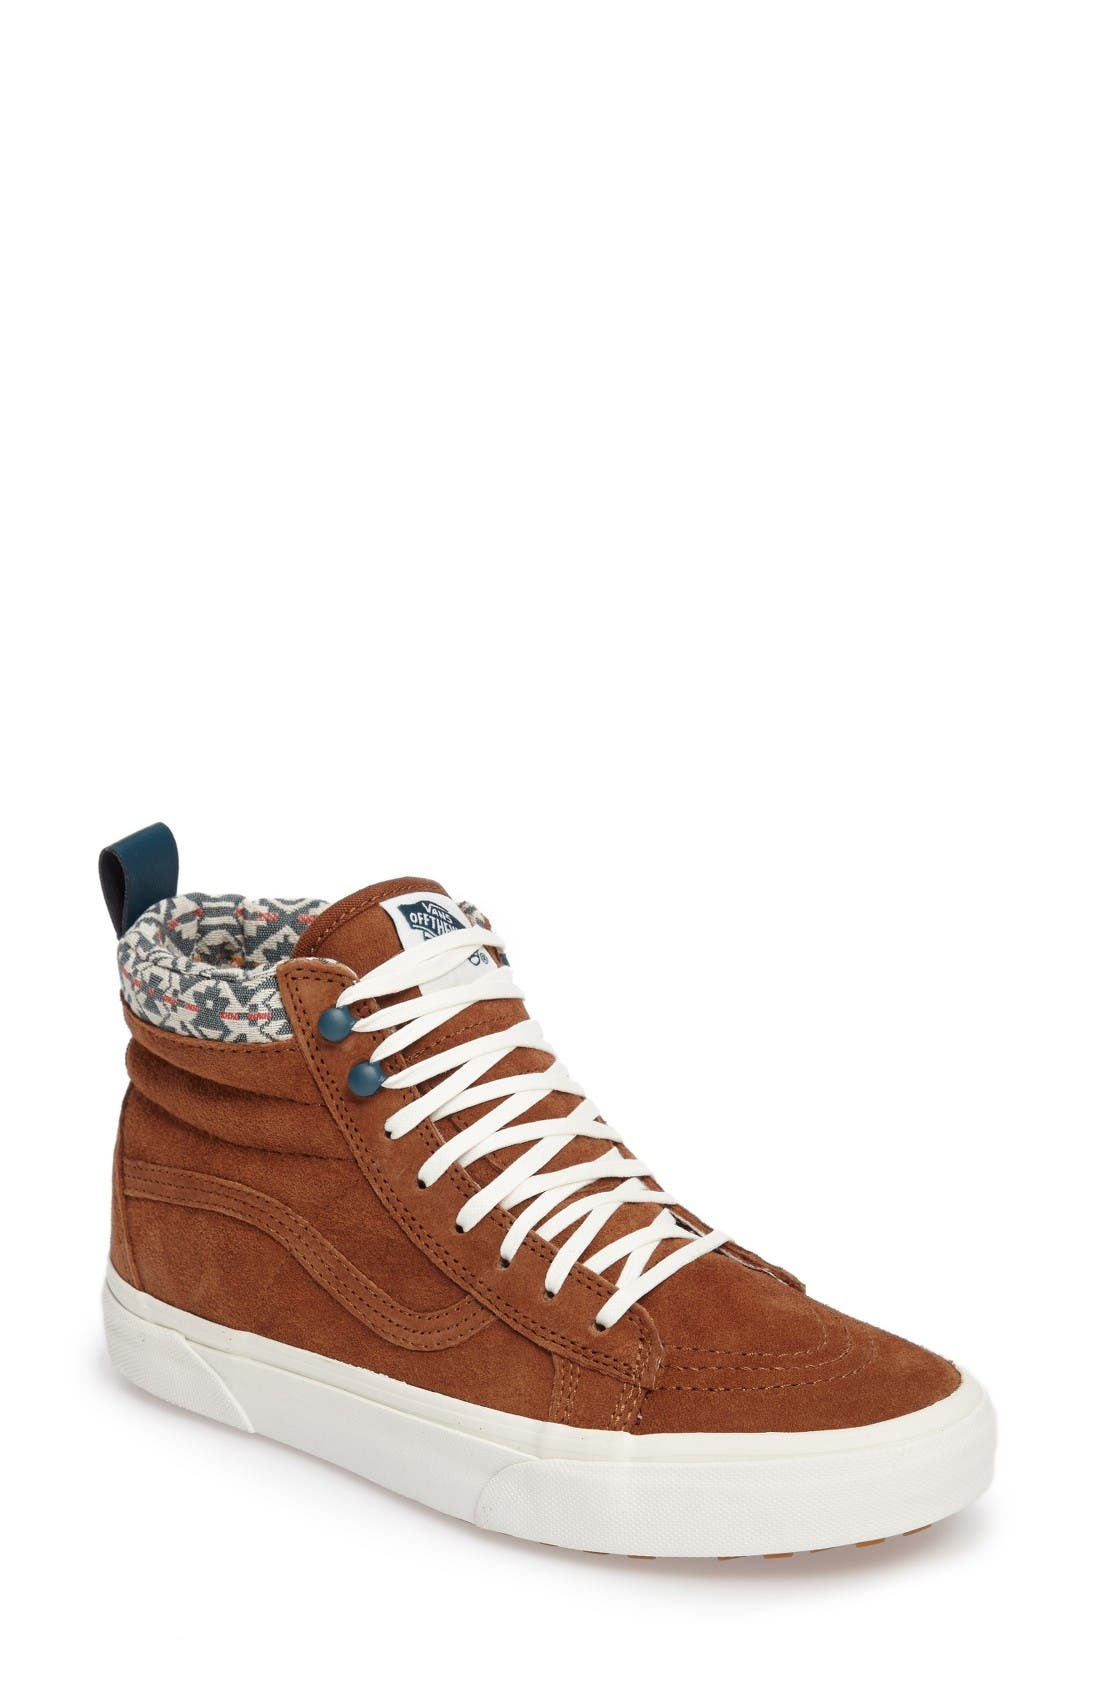 Alternate Image 1 Selected - Vans Sk-8 Hi MTE Sneaker (Women)